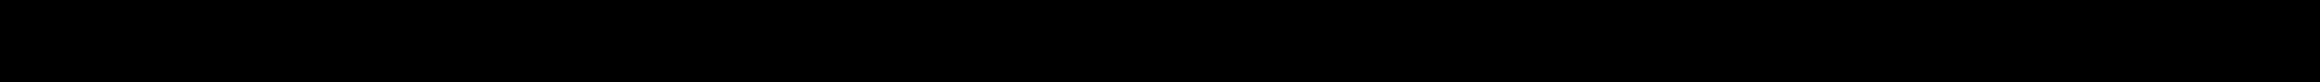 RIDEX 4967923, 5967923, 71712473, 71712479, 71718283 Stoßdämpfer